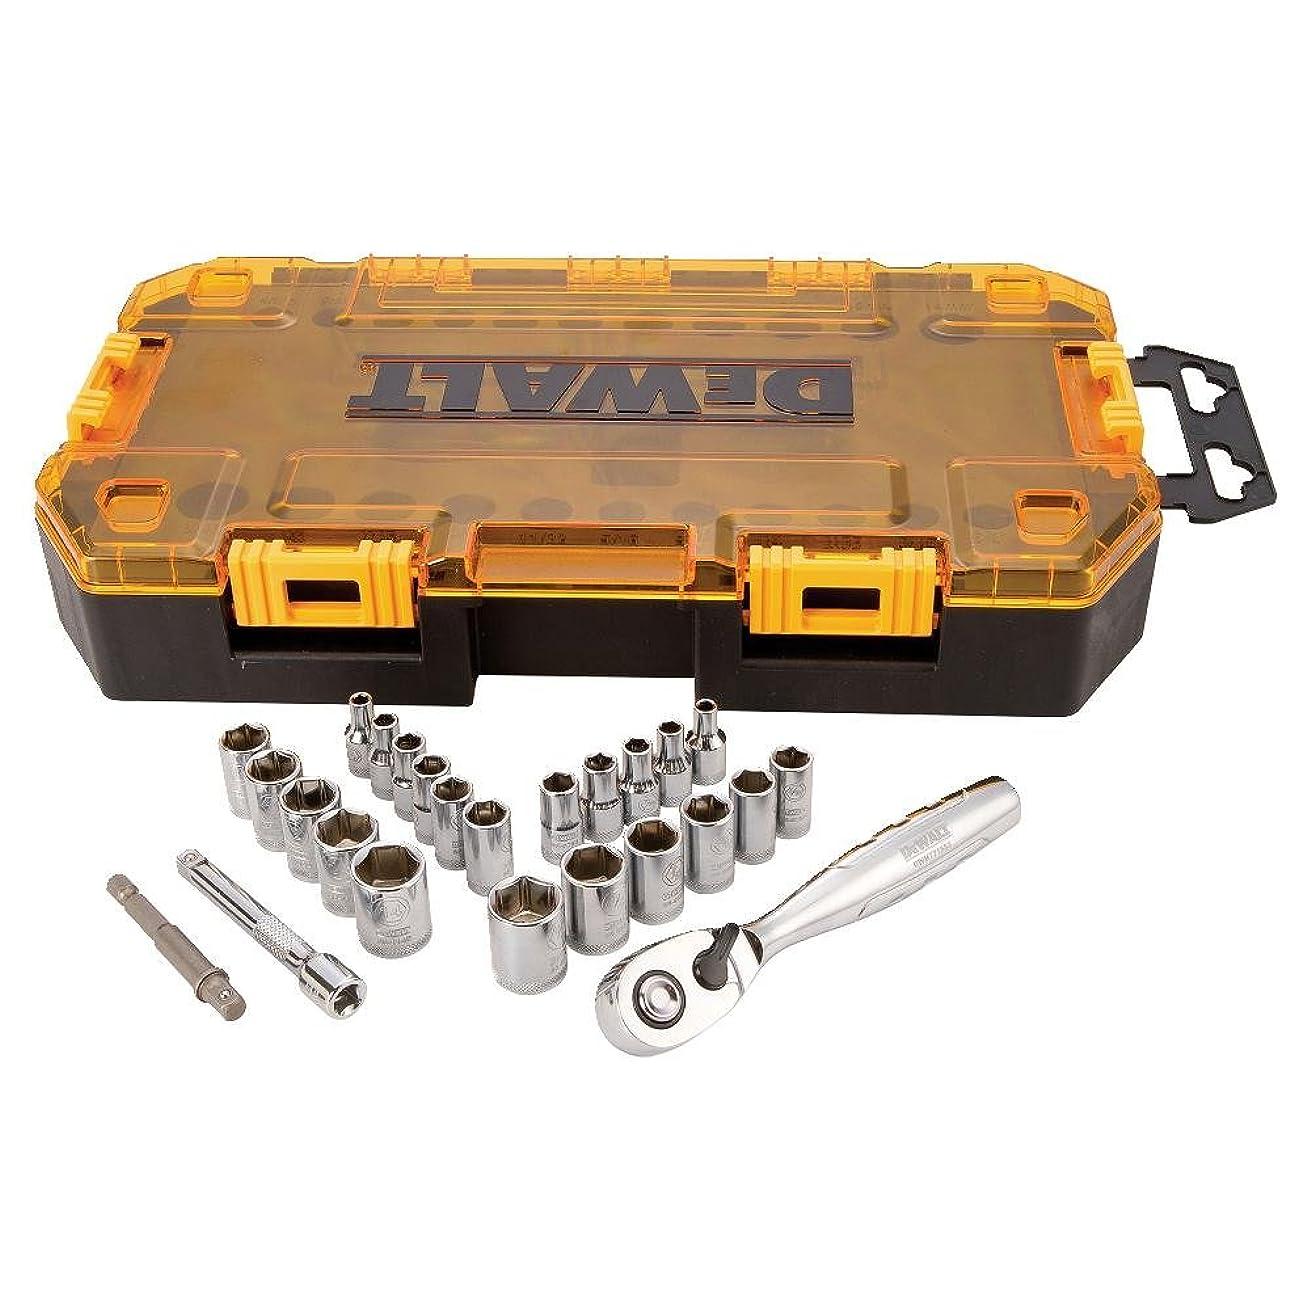 DEWALT DWMT73805 Tool Kit 1/4'' Drive Socket Set, 25 Piece